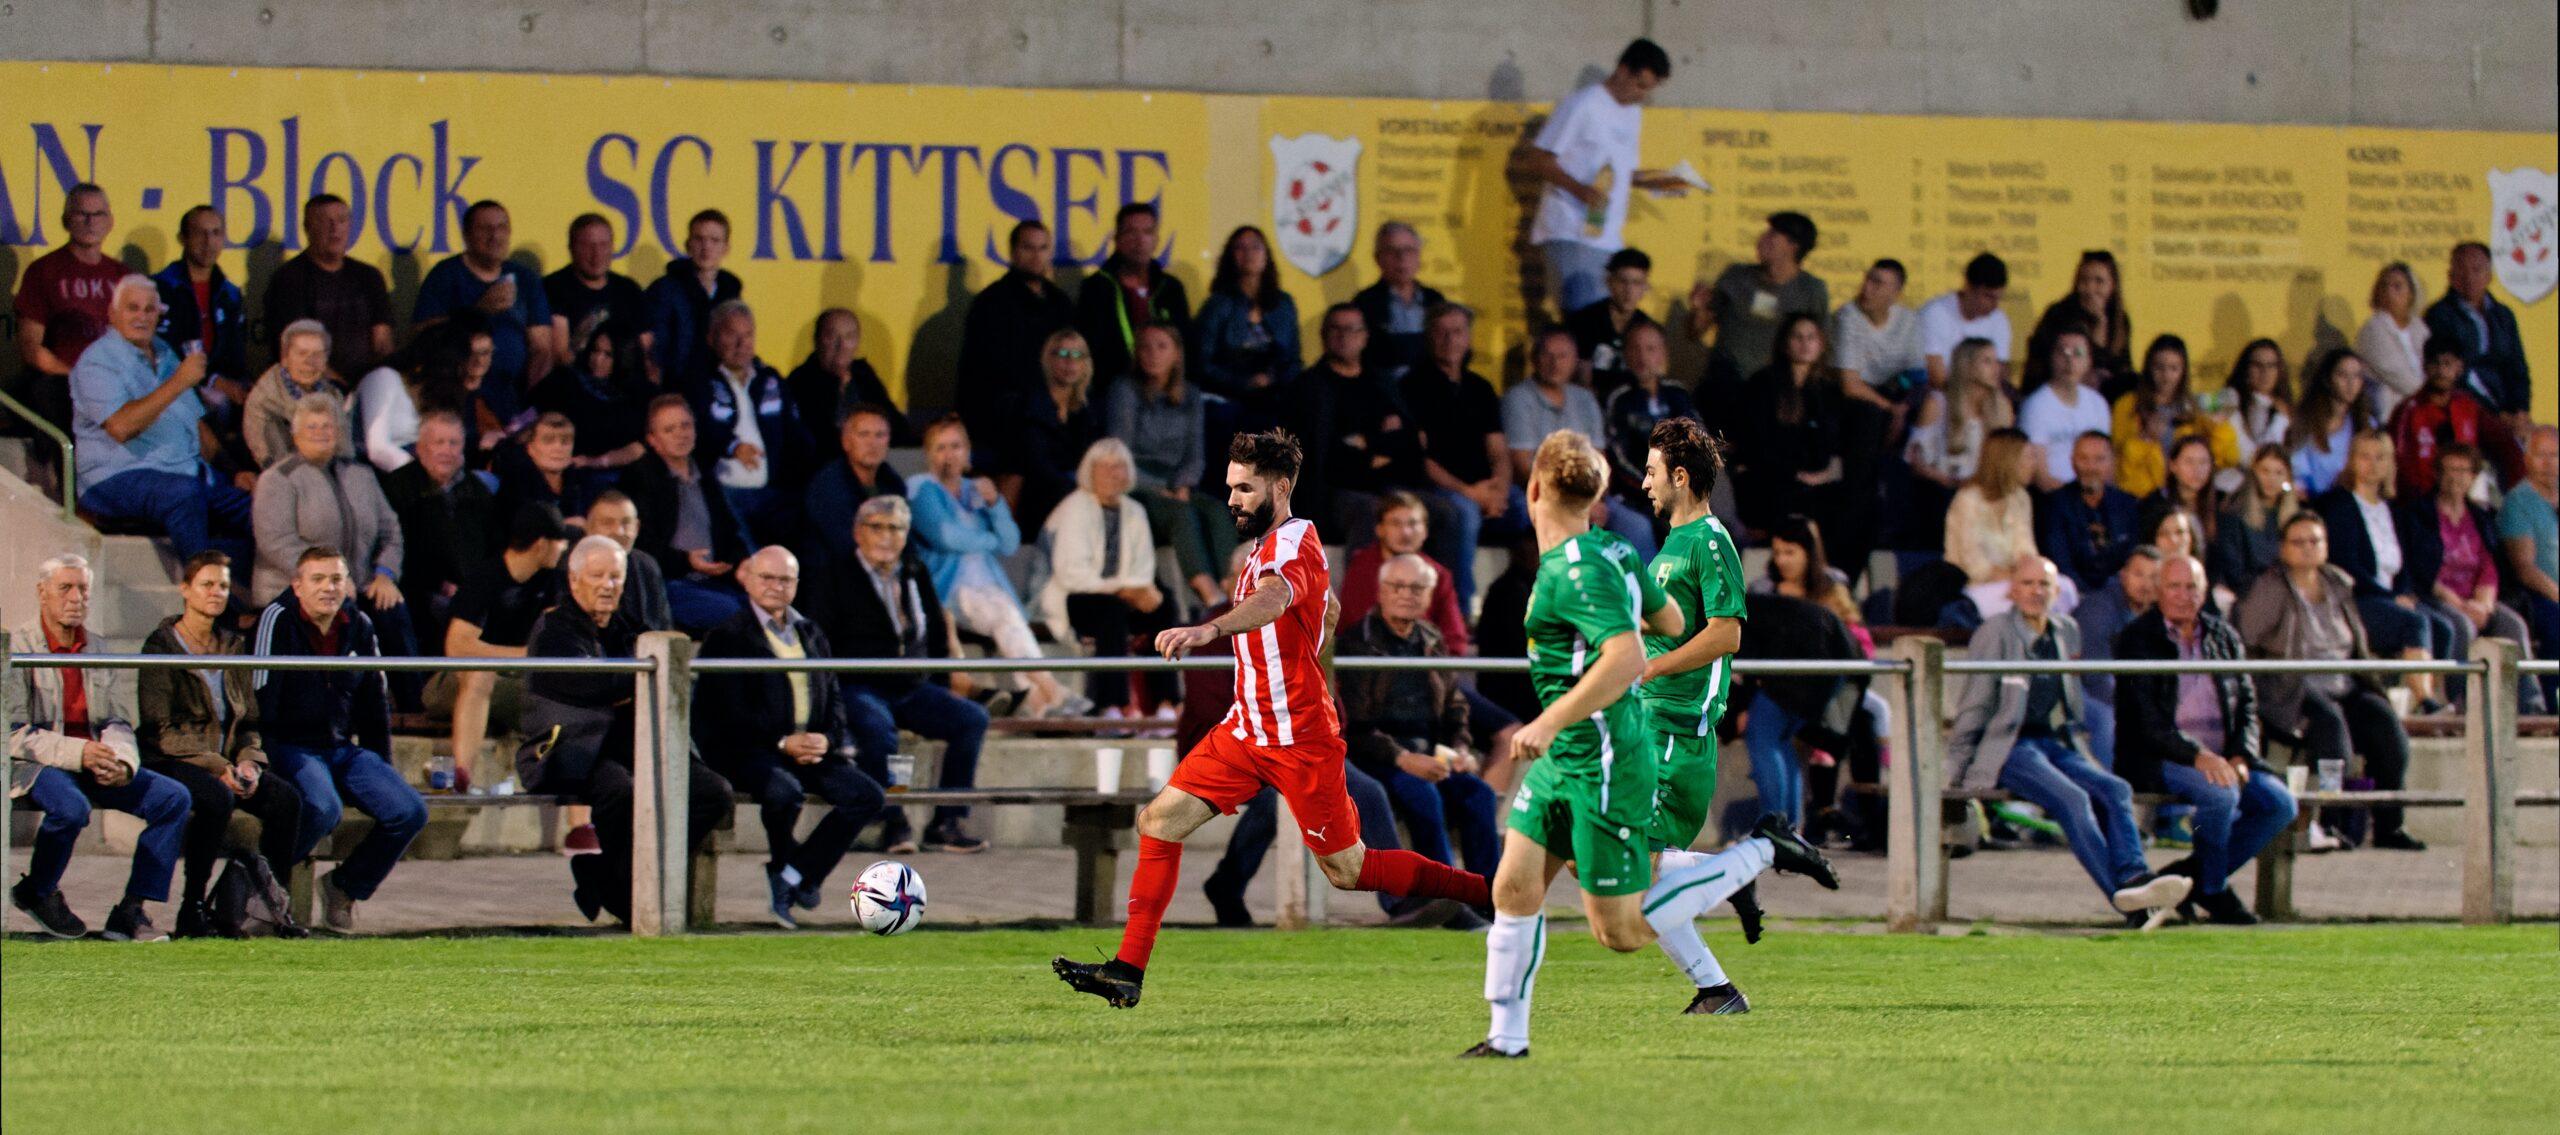 Speedy Juraj Fuska outruns FC Winden am See defenders